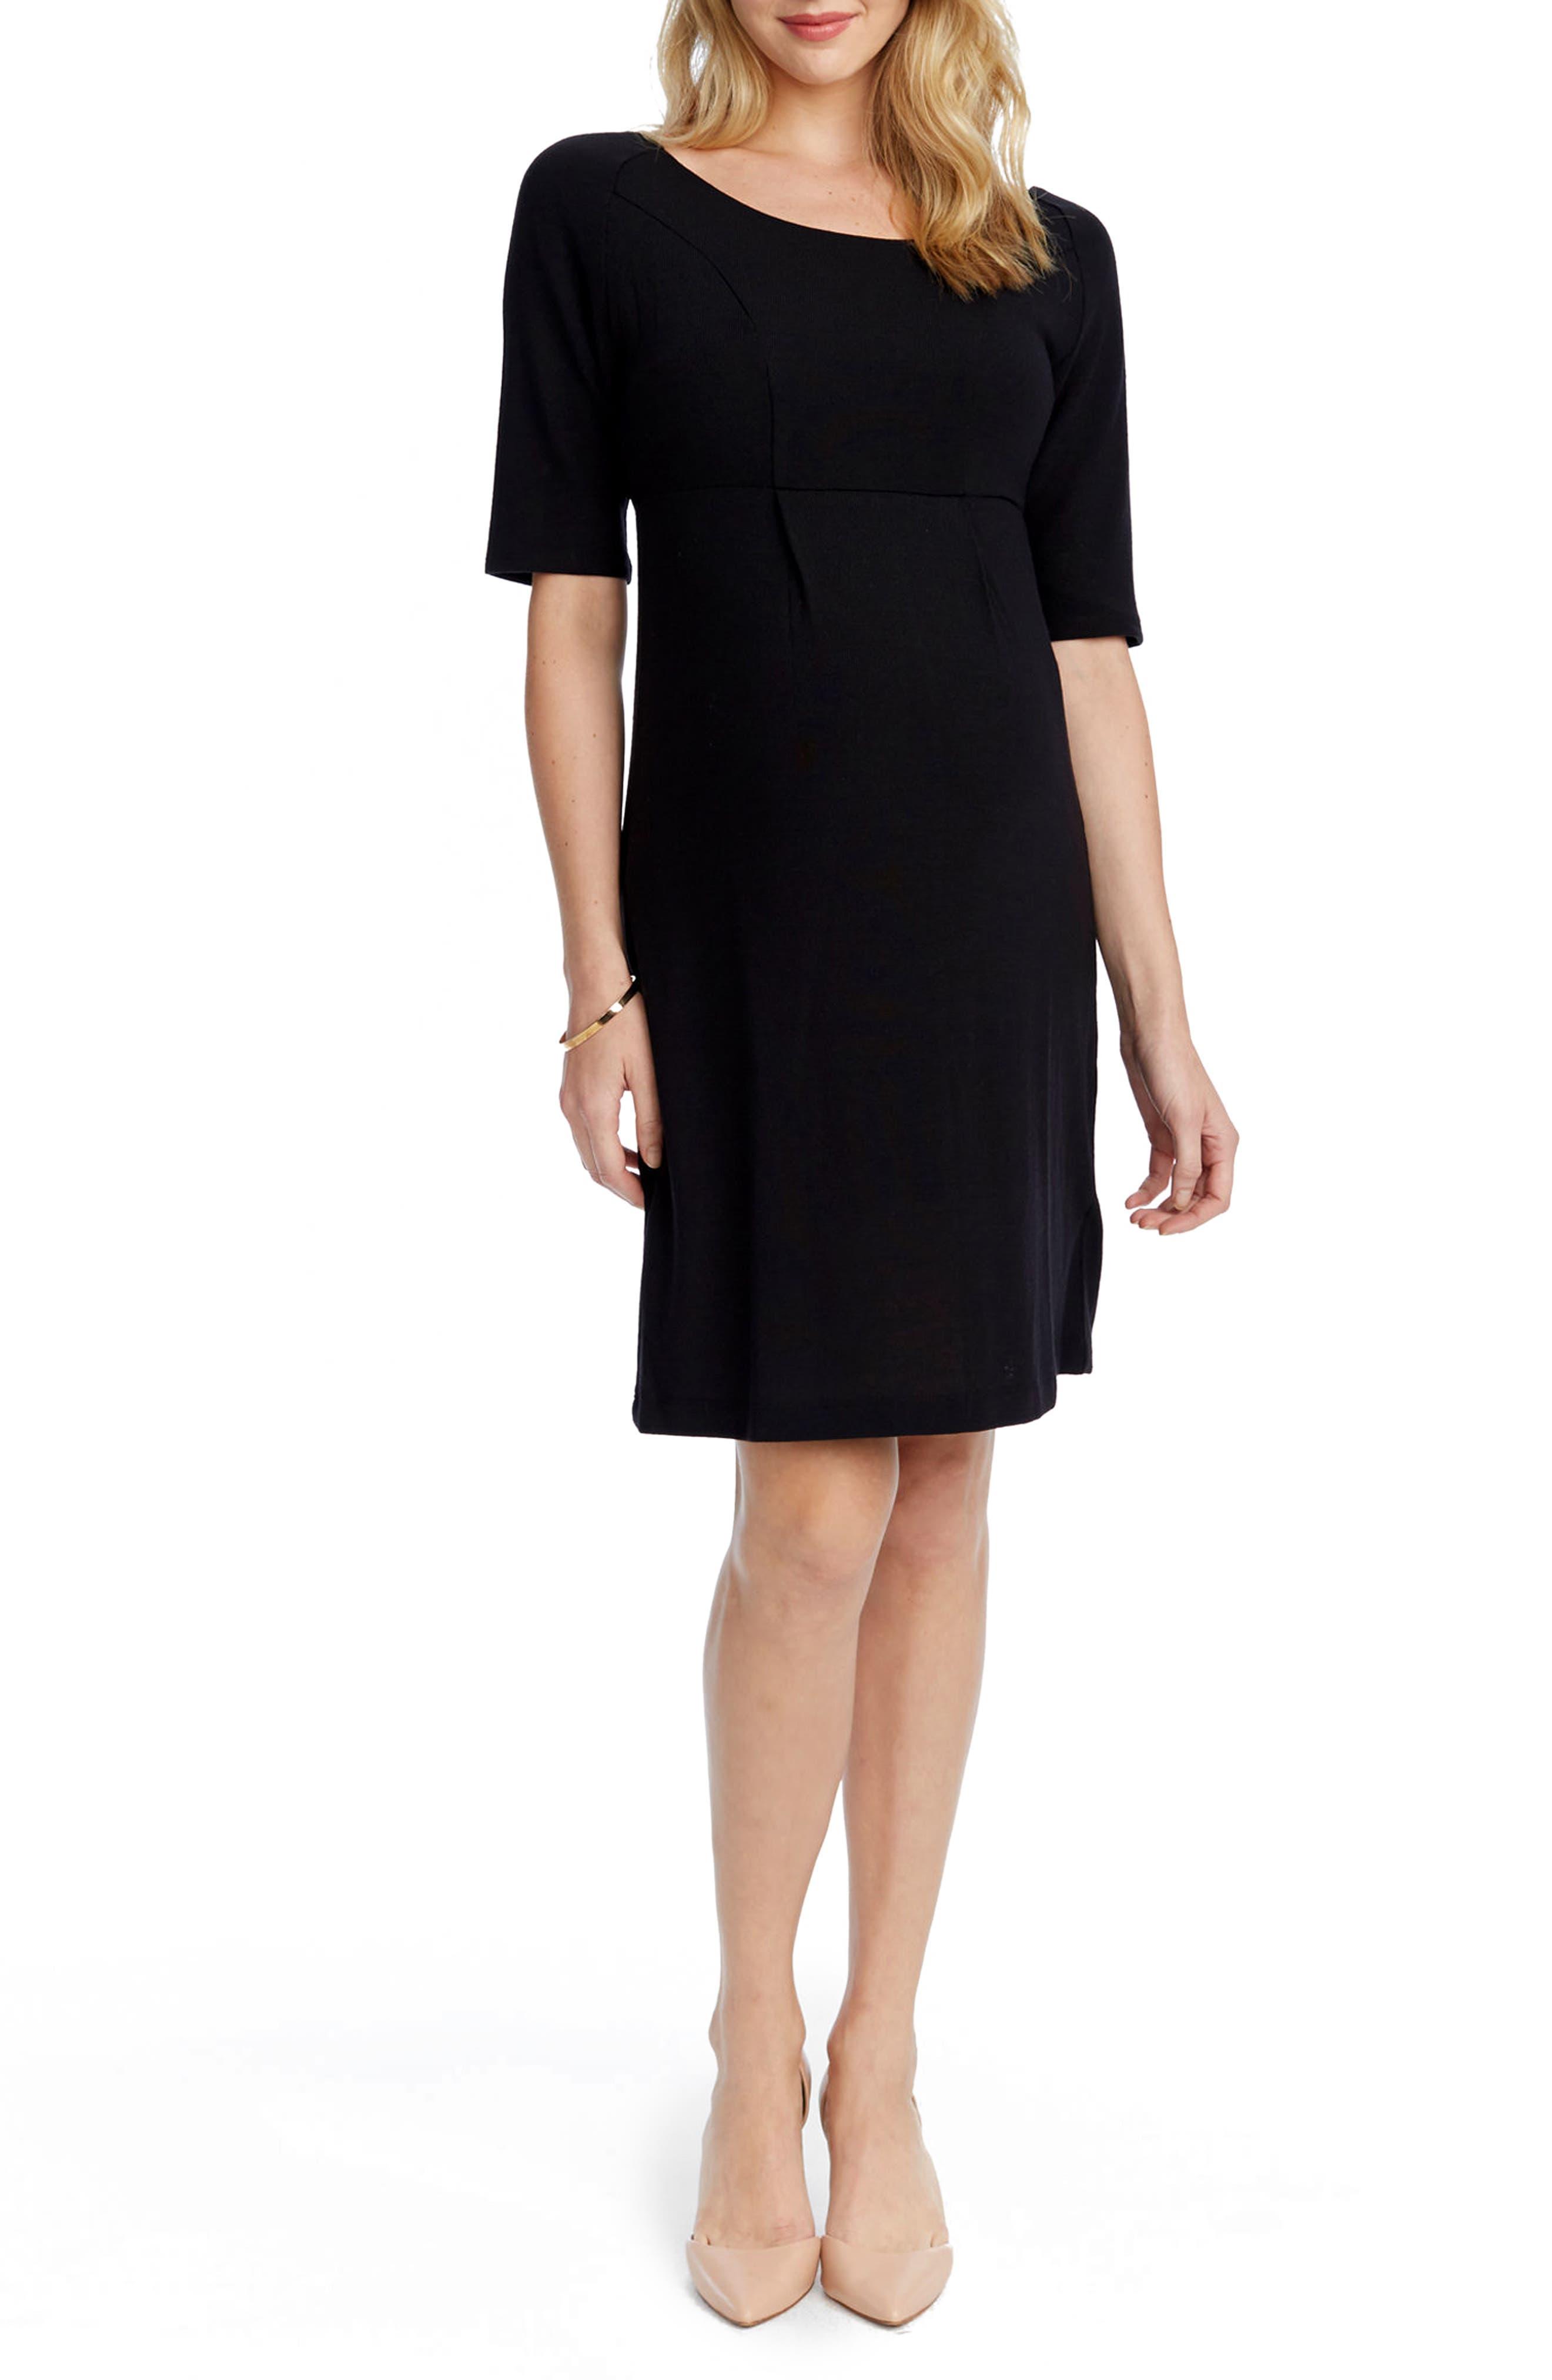 Avery Maternity Sheath Dress,                             Main thumbnail 1, color,                             BLACK